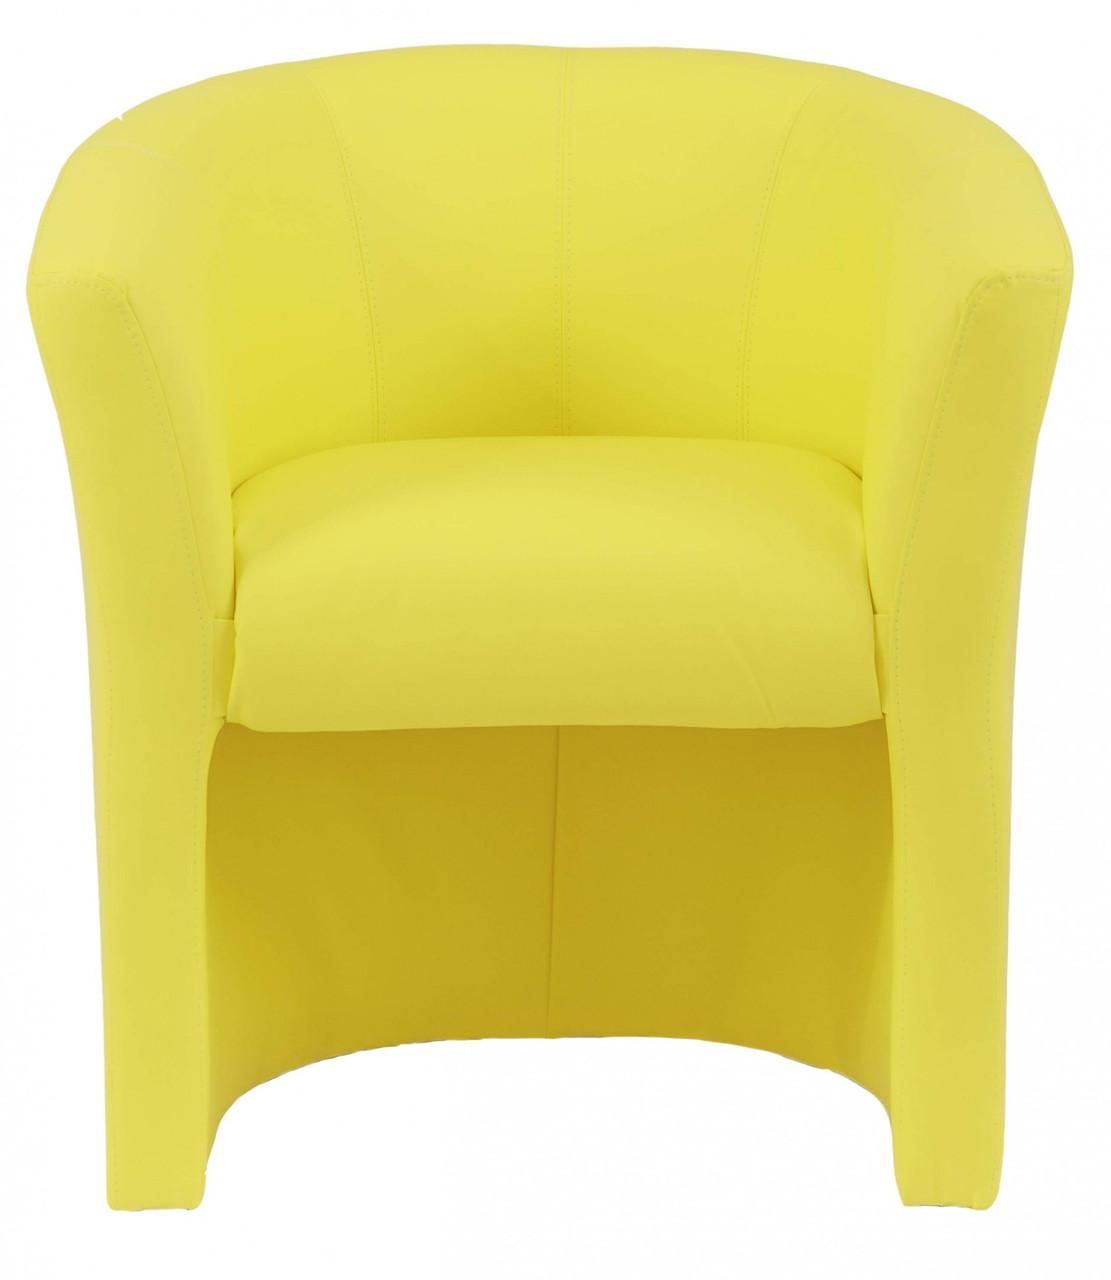 Кресло Richman Бум Единица 650 x 650 x 800H см Флай 2240 Желтое